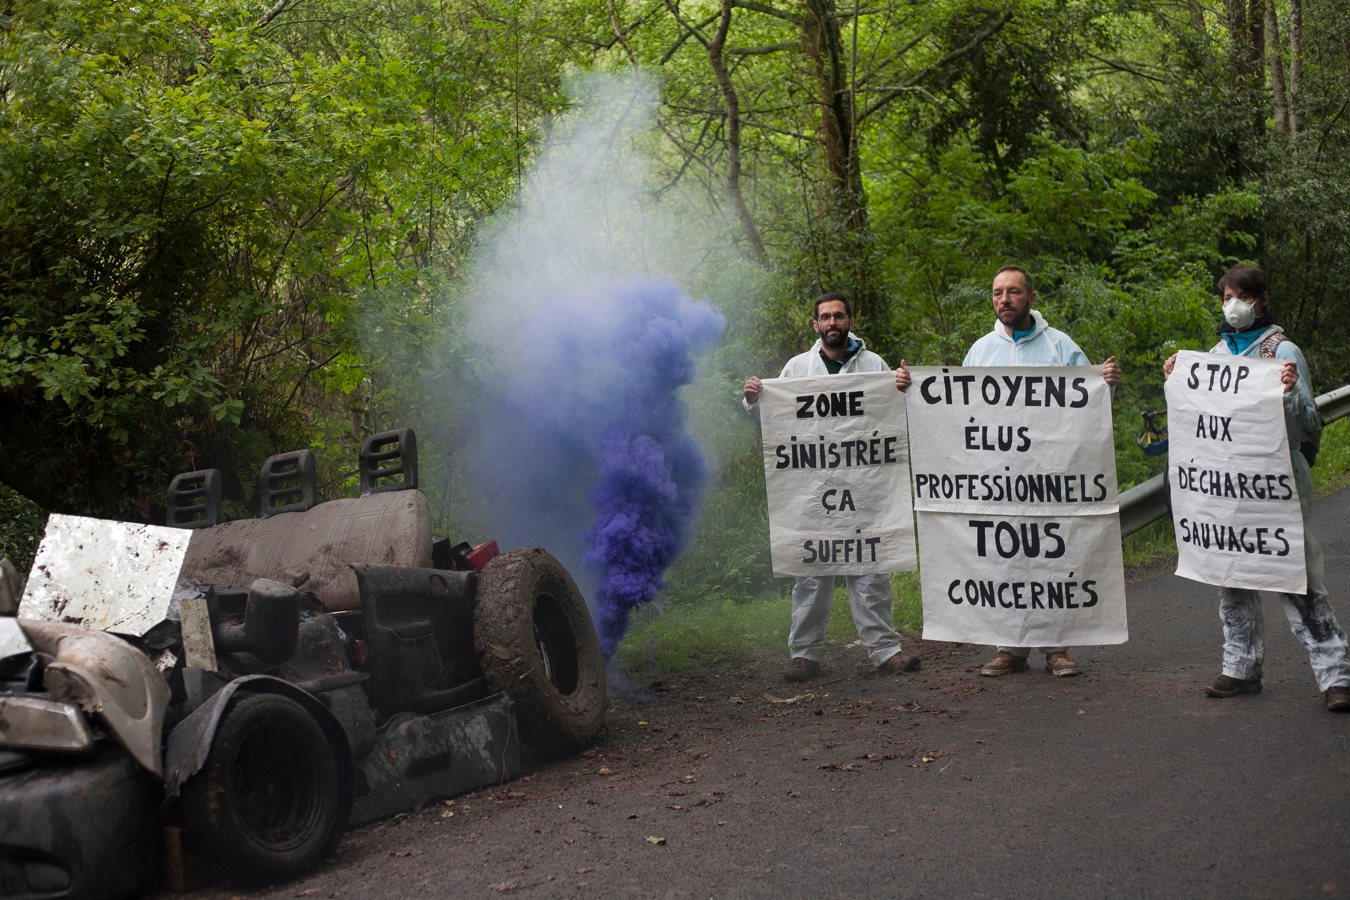 Nettoyage citoyen zone naturelle, Bayonne